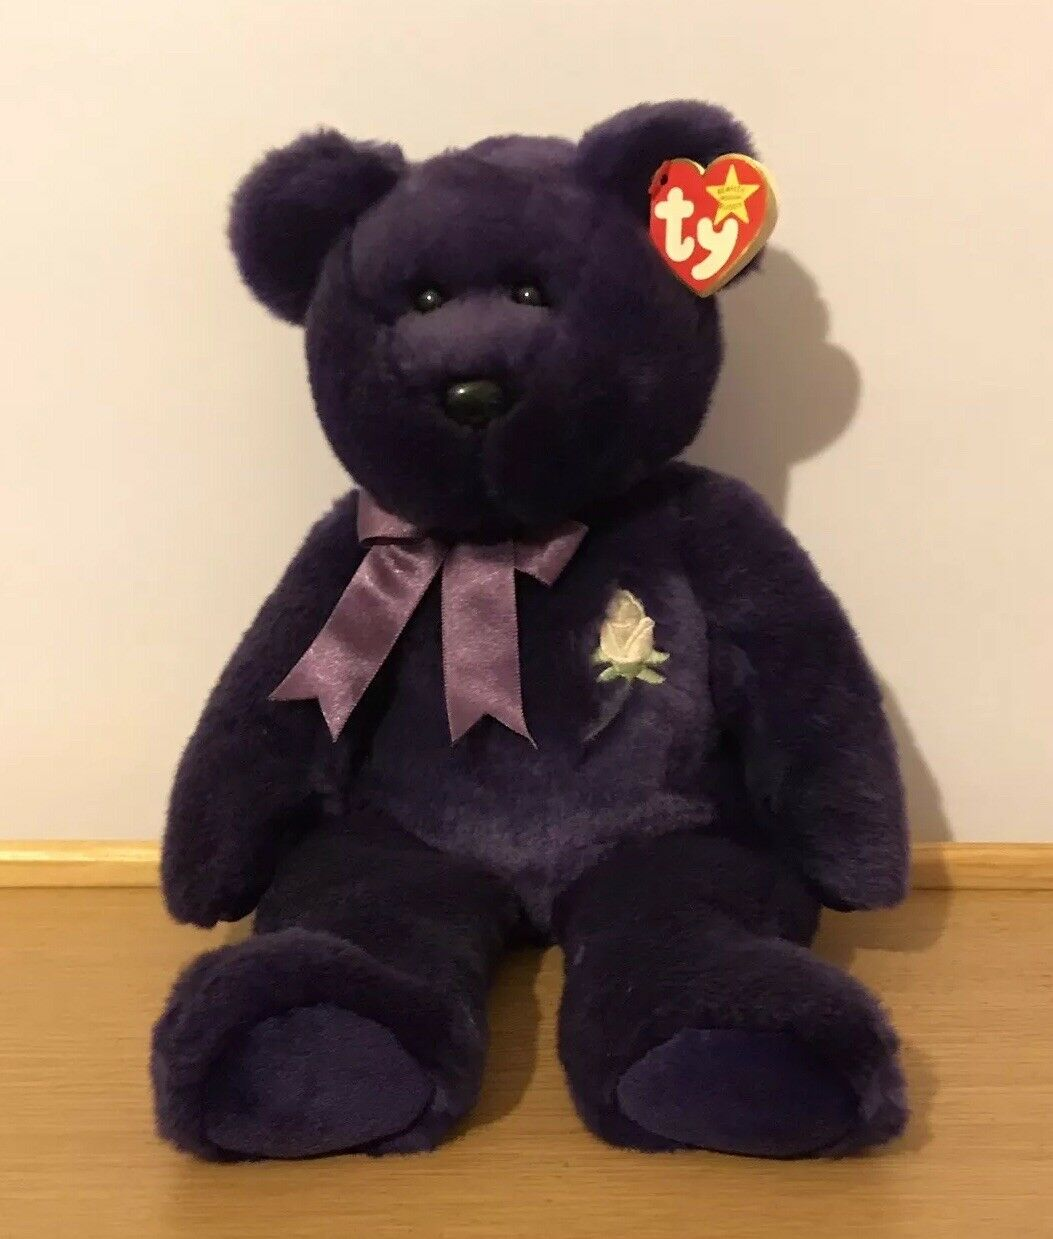 "Ty Beanie Buddies 1998 Princess Diana Teddy Bear 14"" Tall Collectable Brand New"